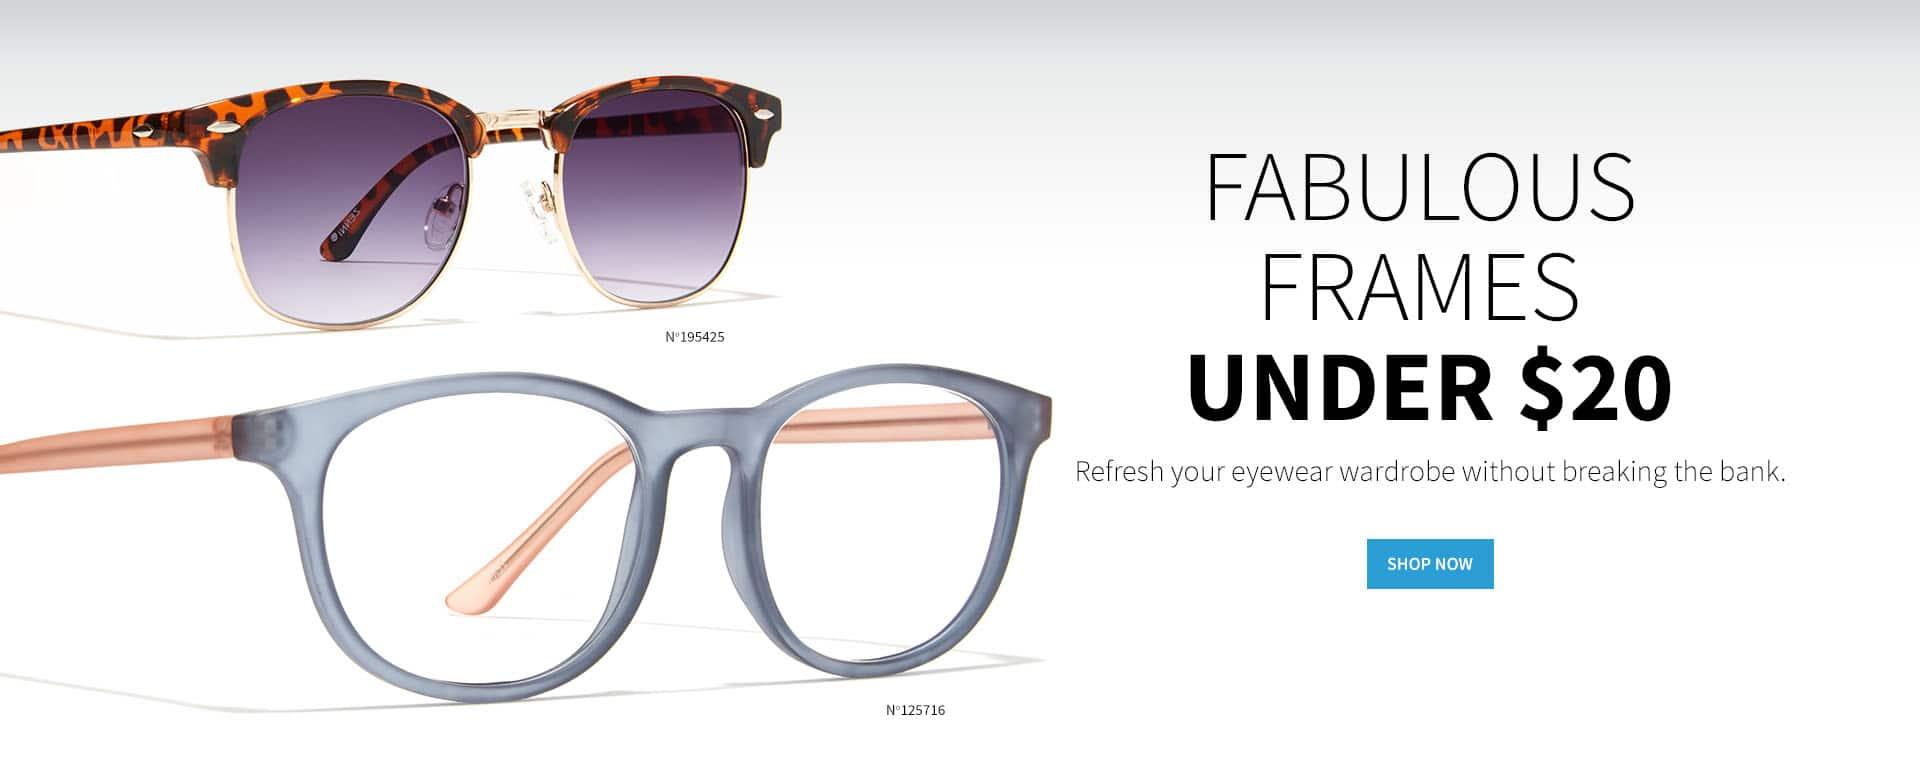 Zenni Optical Glasses Quality : Zenni Optical Affordable Rx Eyeglasses Online